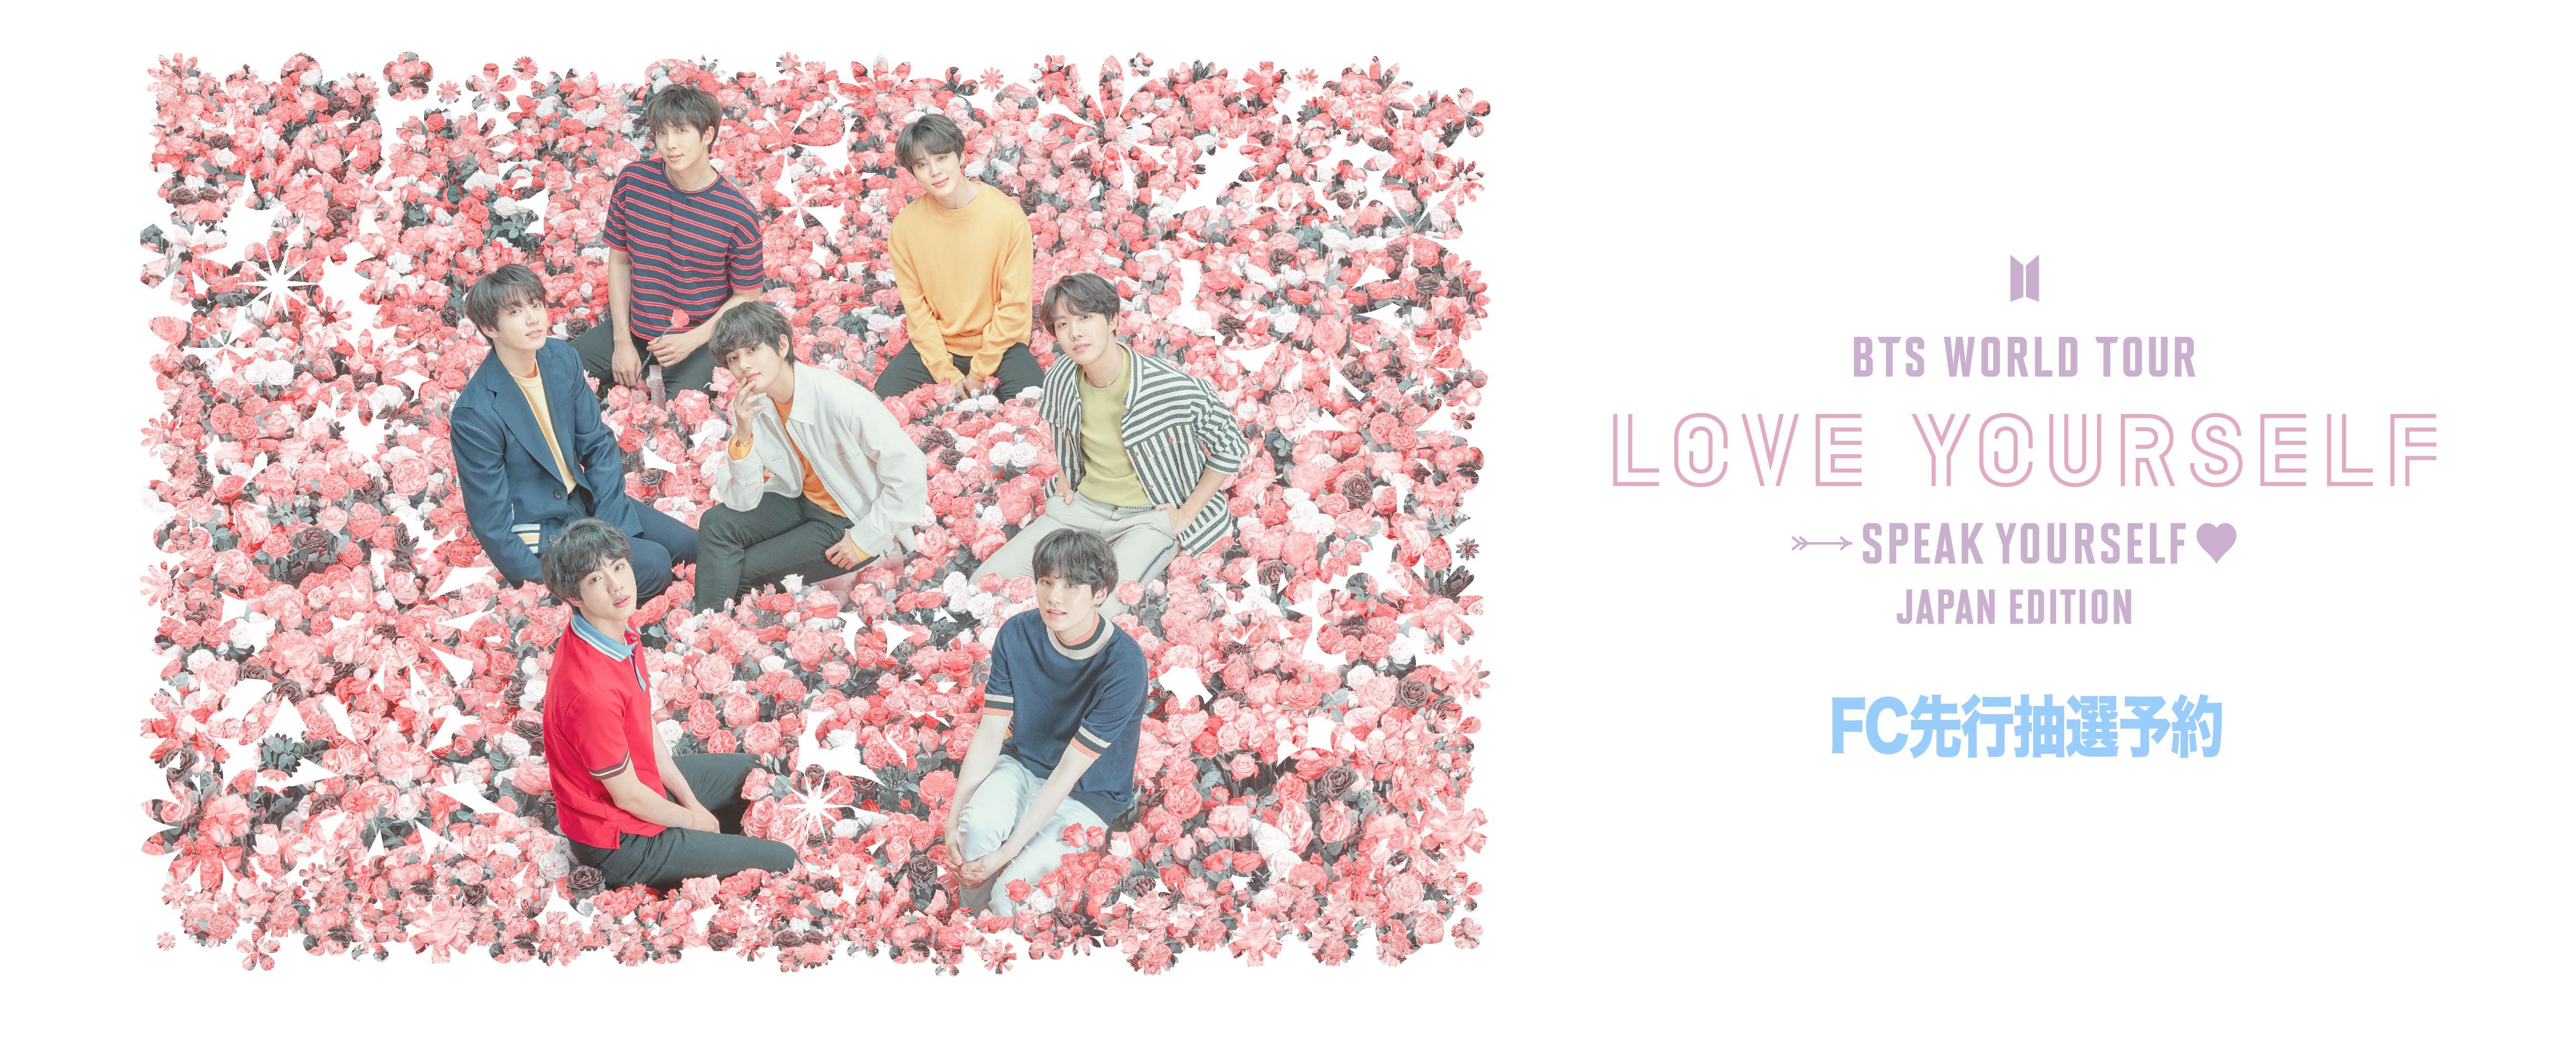 BTS WORLD TOUR 'LOVE YOURSELF: SPEAK YOURSELF' – JAPAN EDITION FC先行